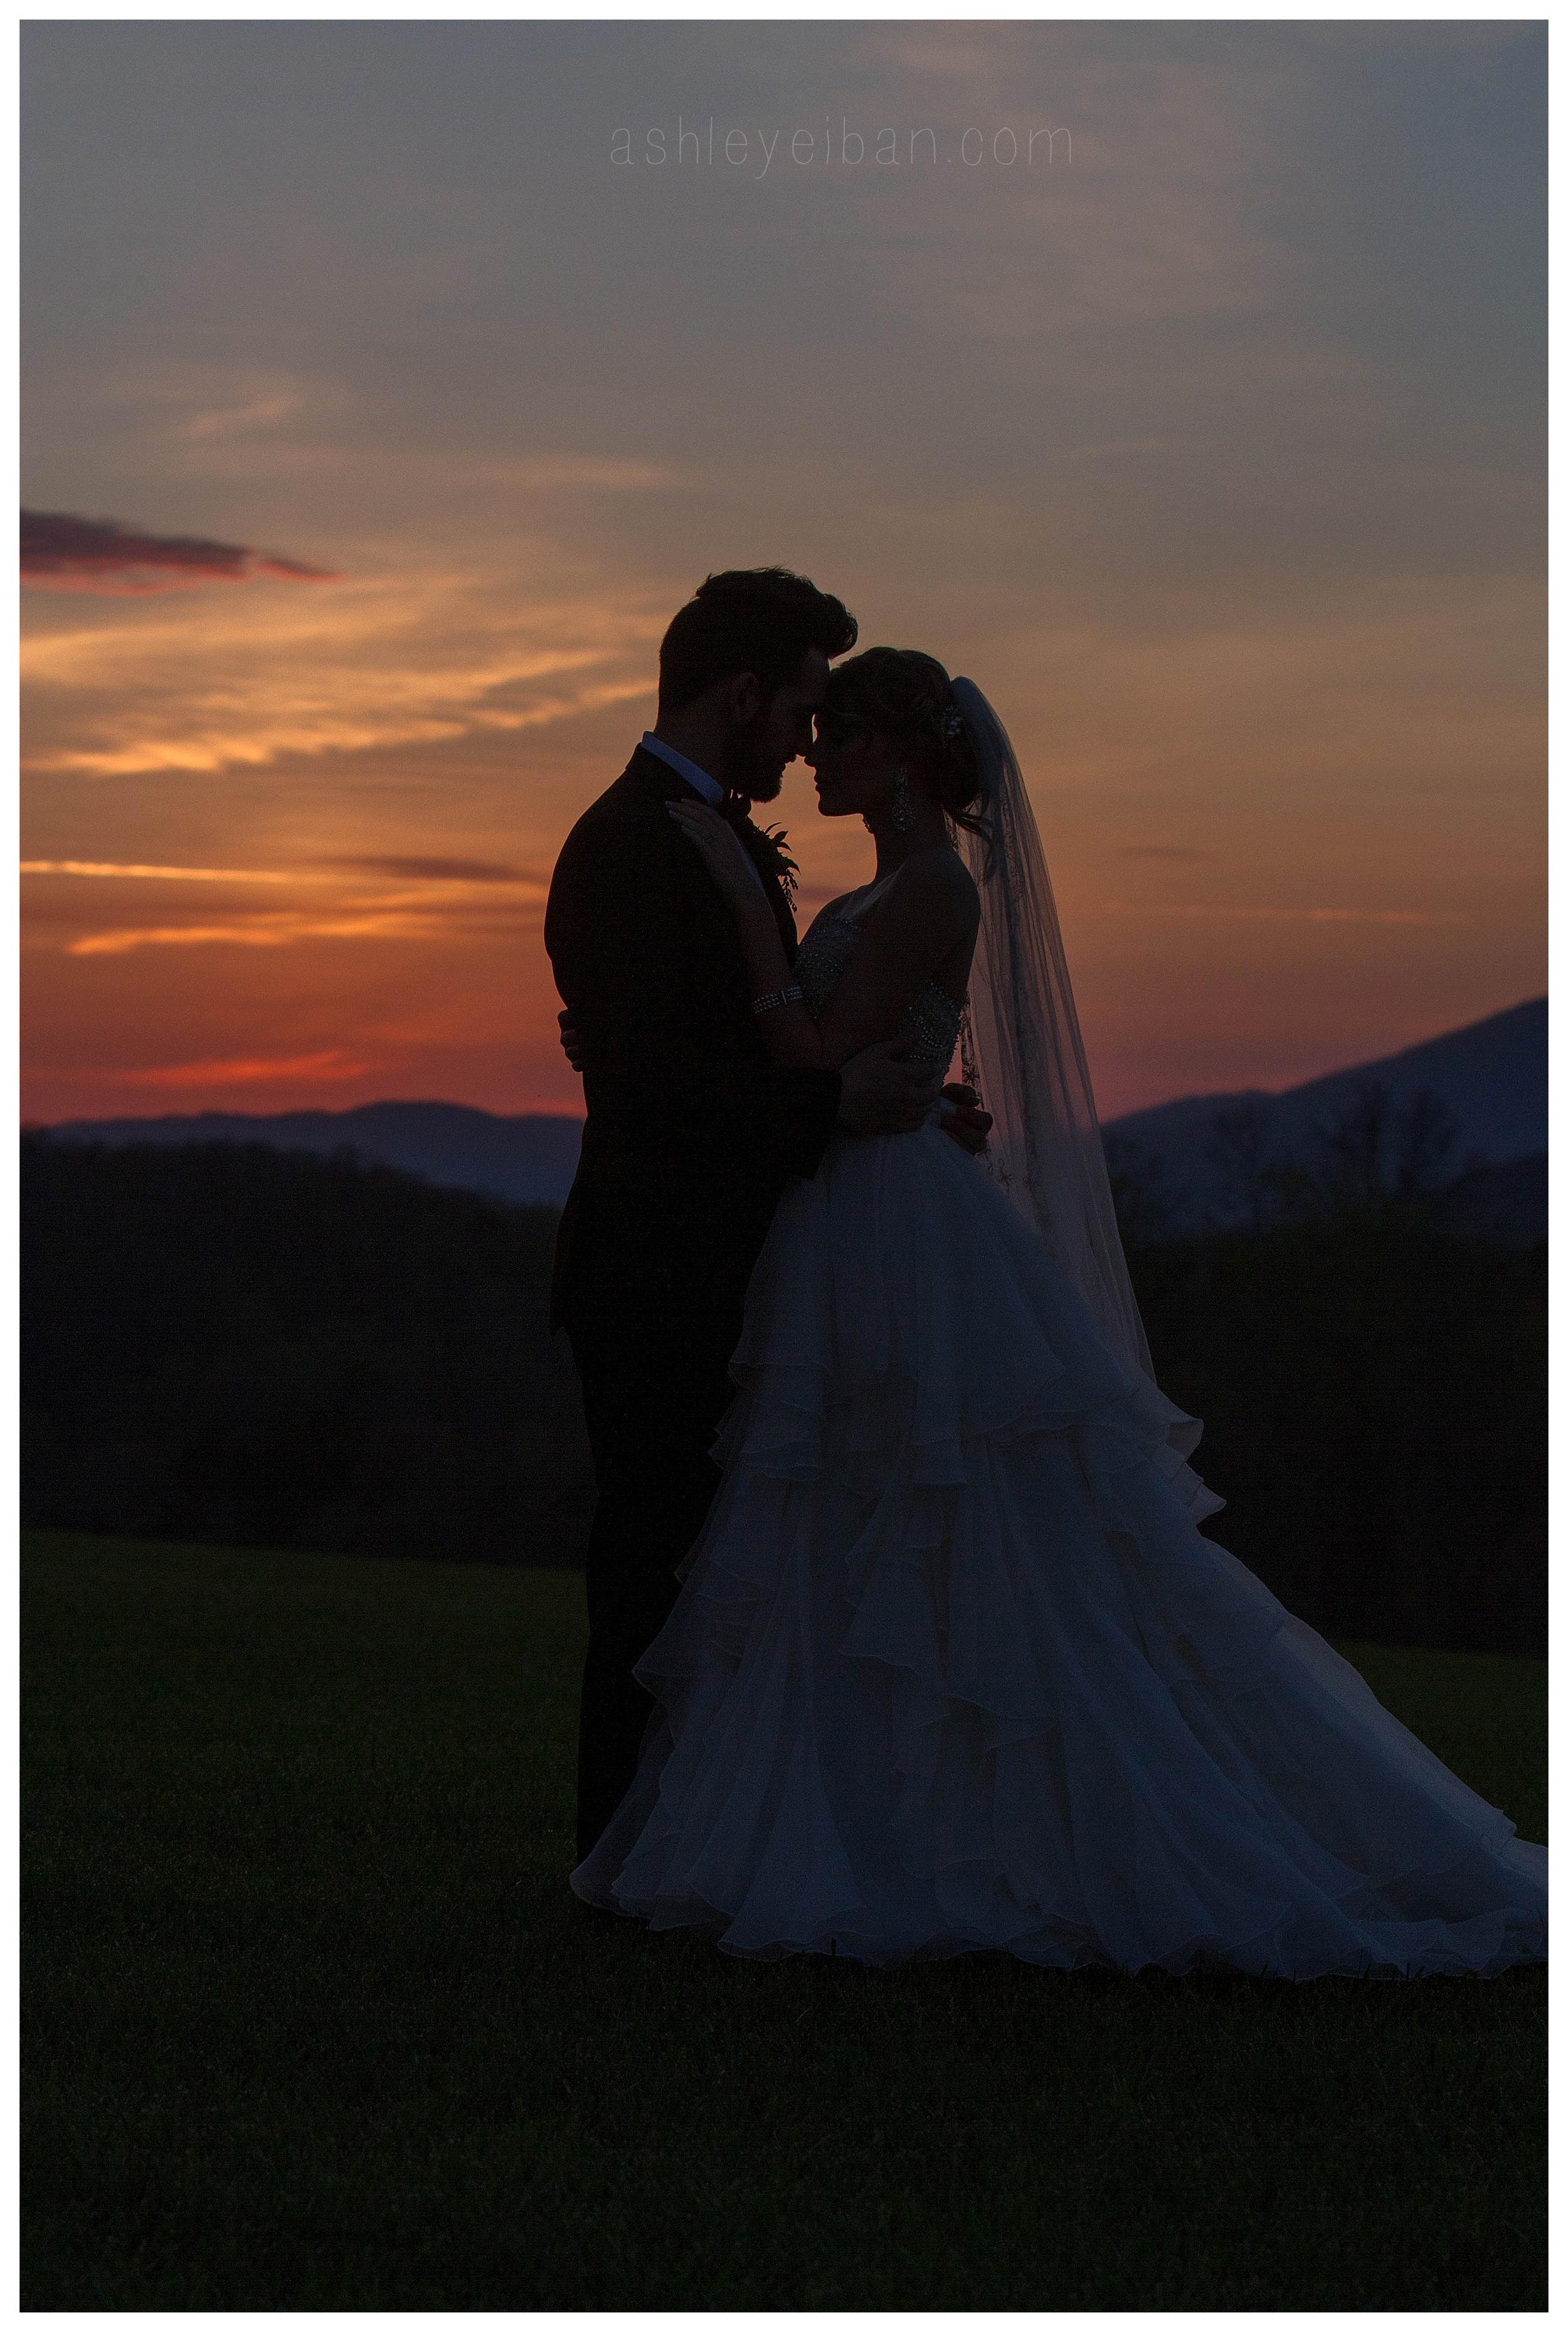 Sierra Vista Wedding Photographer, Lynchburg Wedding Photographer, Ashley Eiban Photography, www.ashleyeiban.com